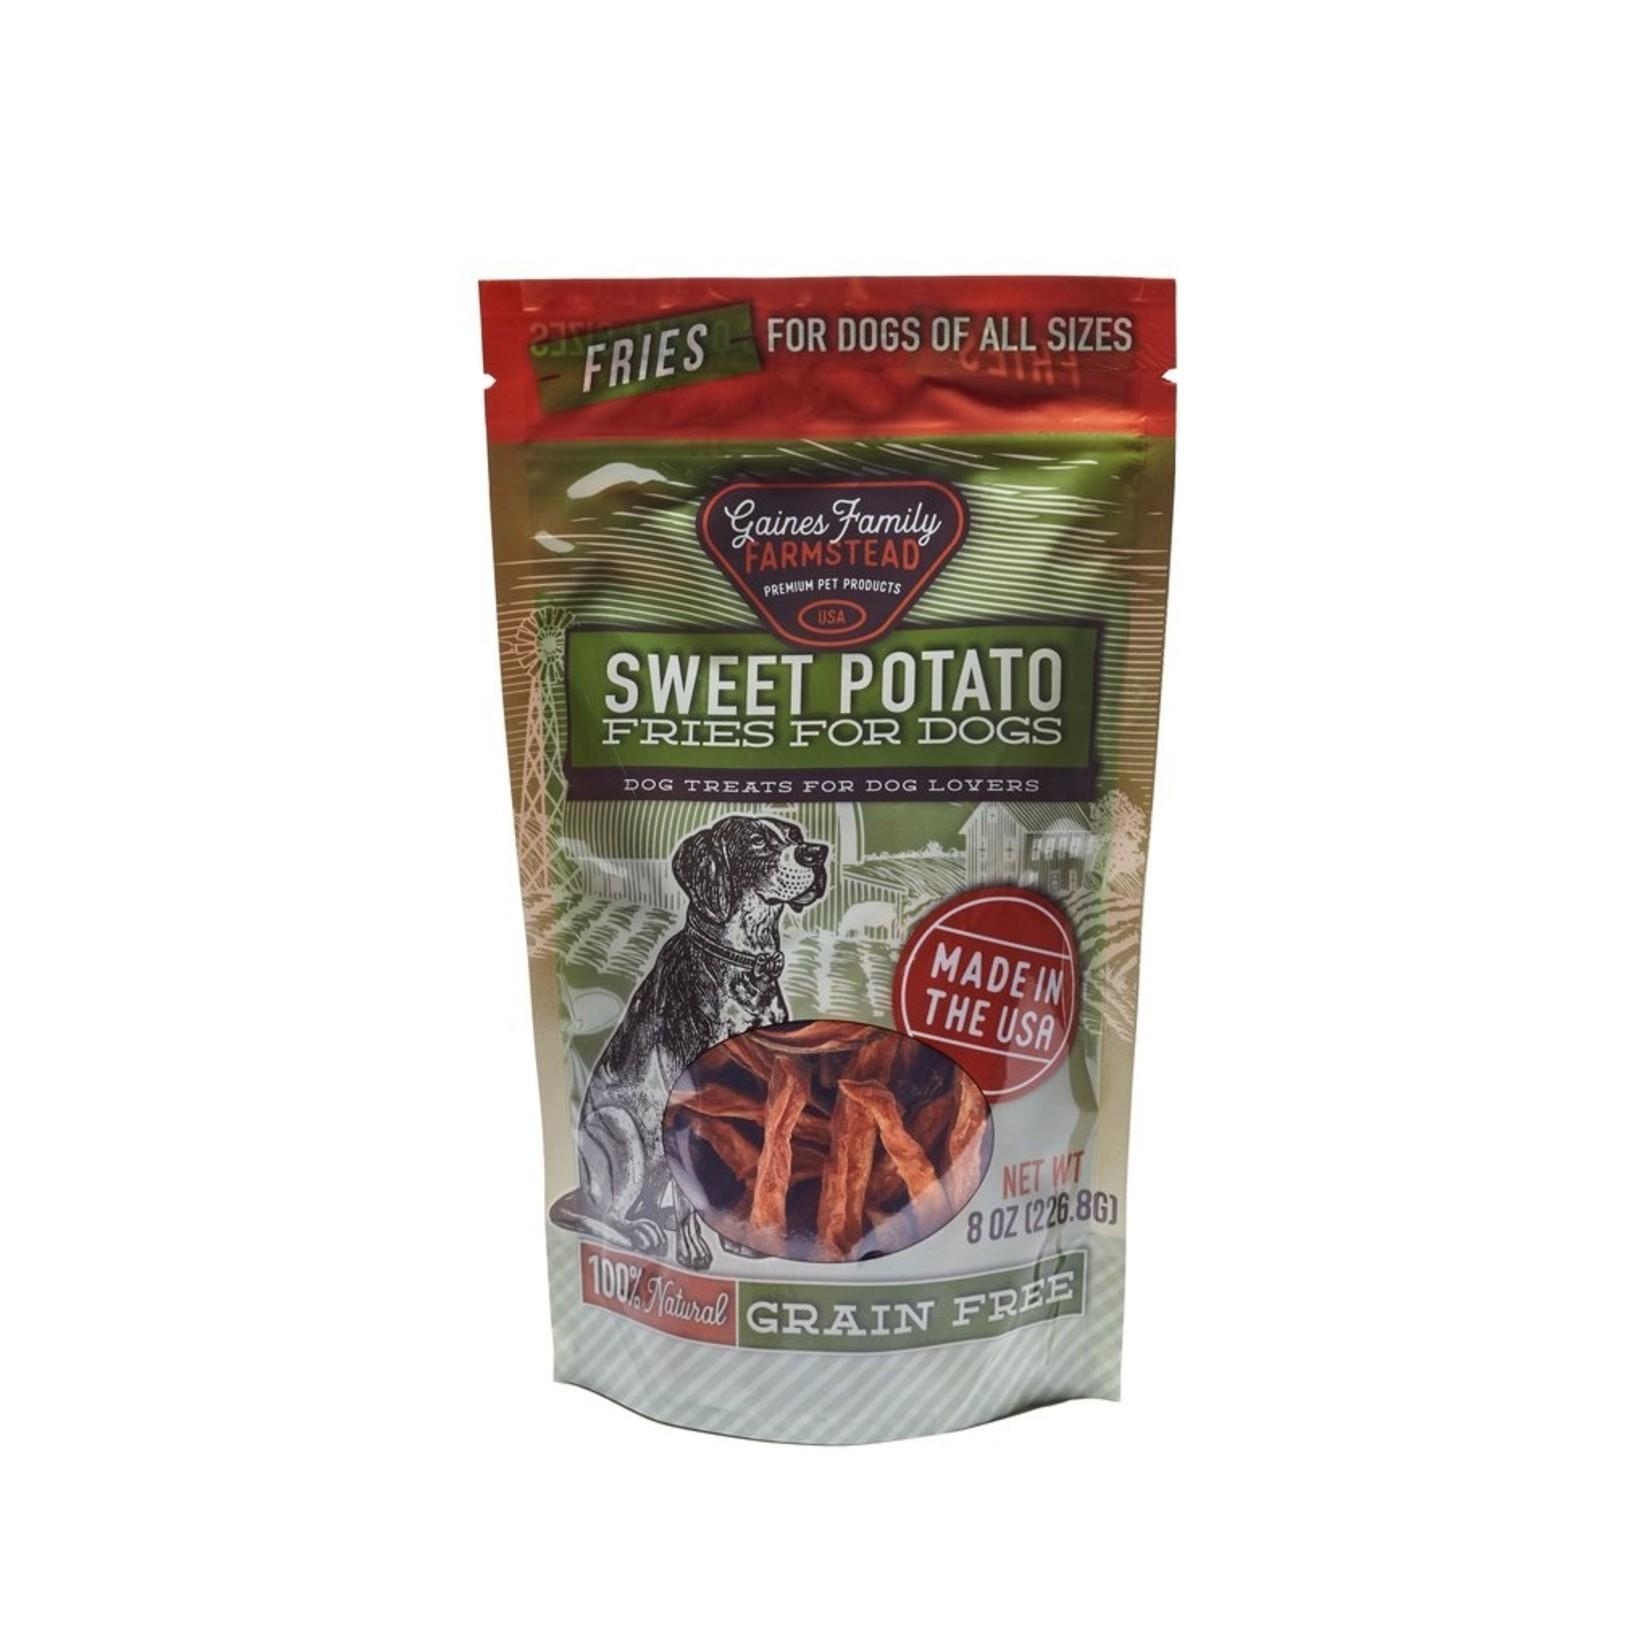 Gaines Family Gaines Family Sweet Potato Fries Dog Treats 8oz